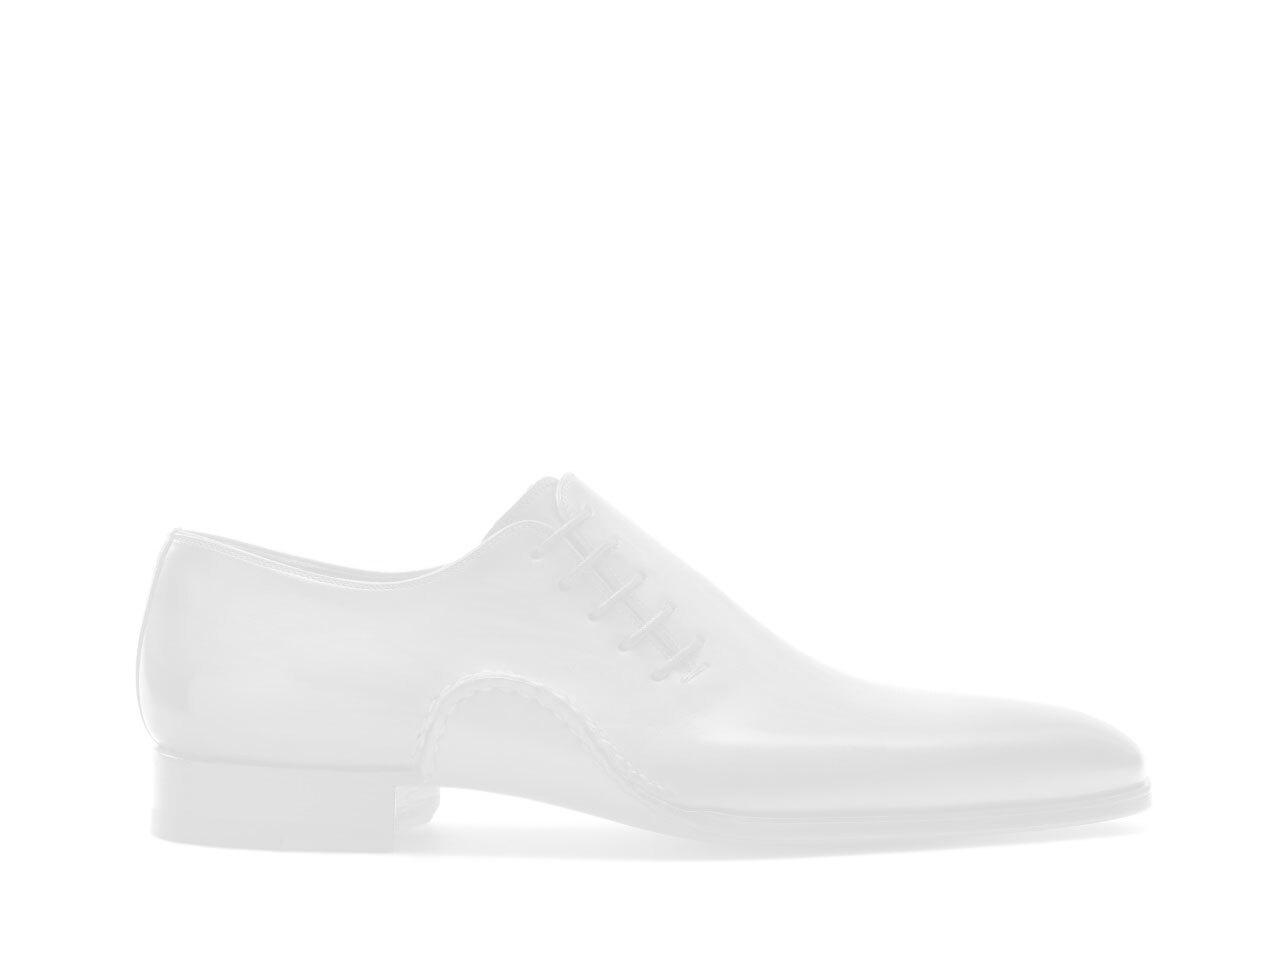 Navy blue leather double monk strap shoes for men - Magnanni